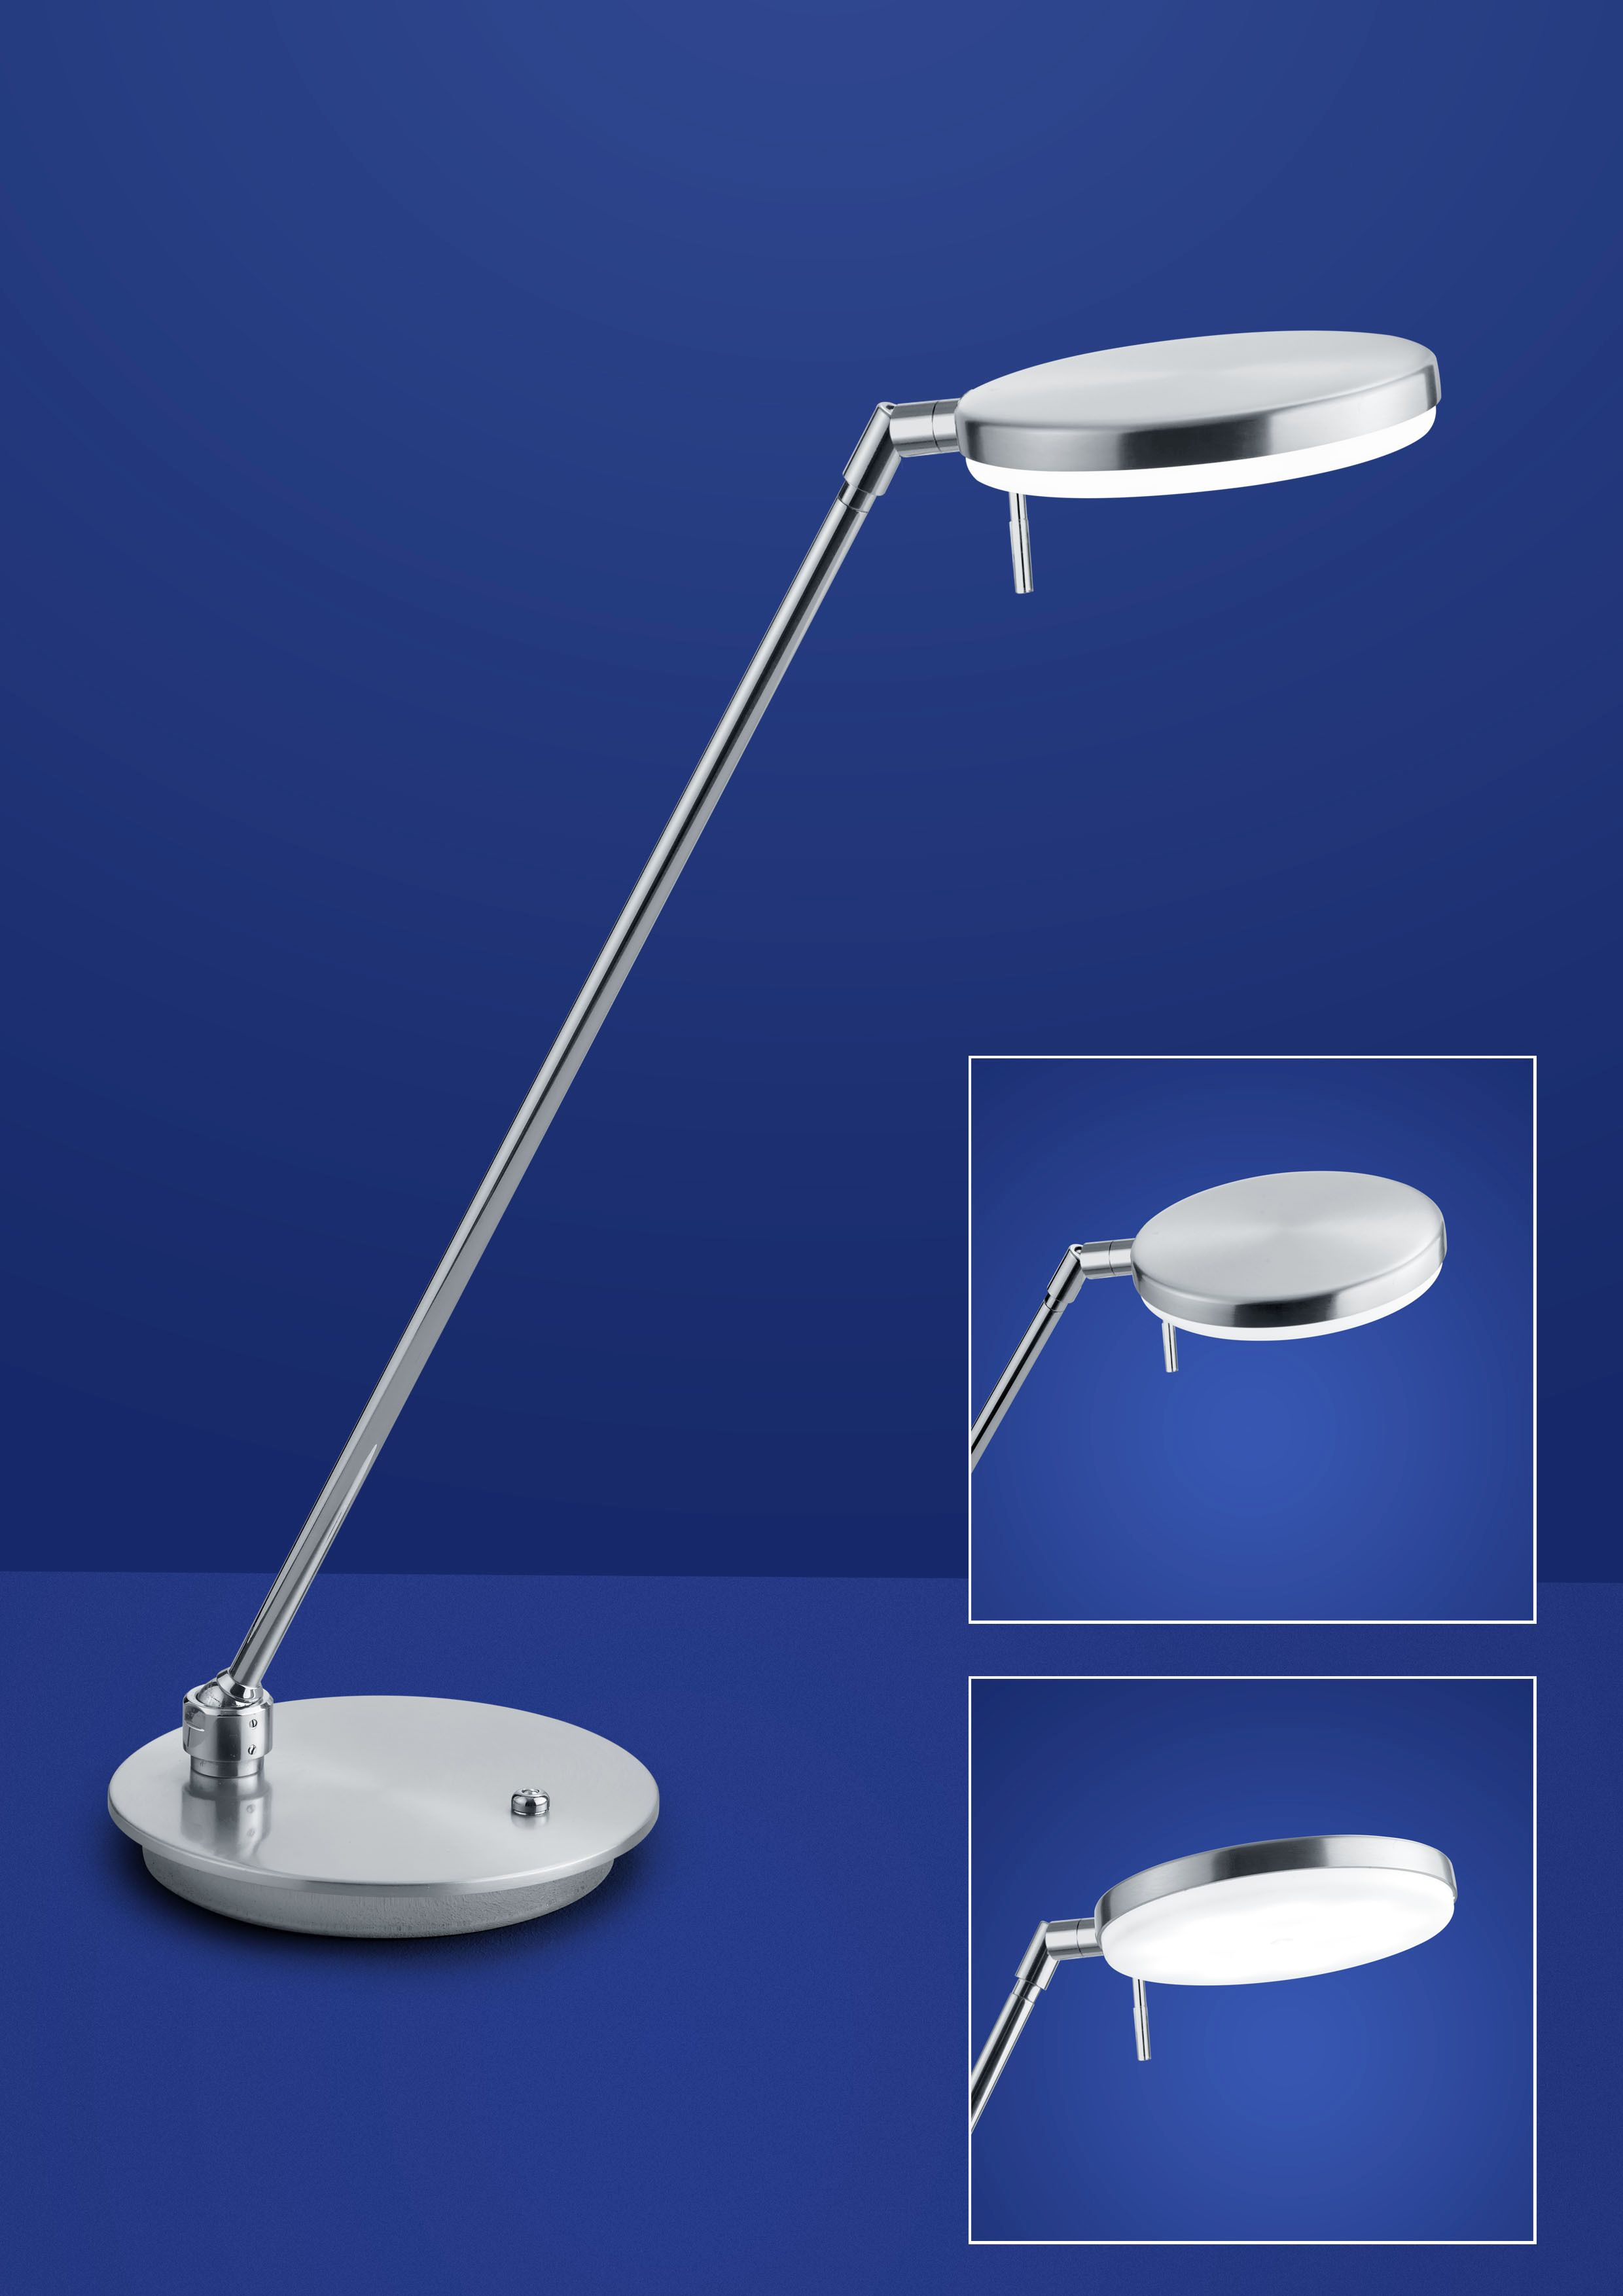 B-Leuchten Omega LED-Stehleuchte 60318/1-01 - LEUCHTENKING